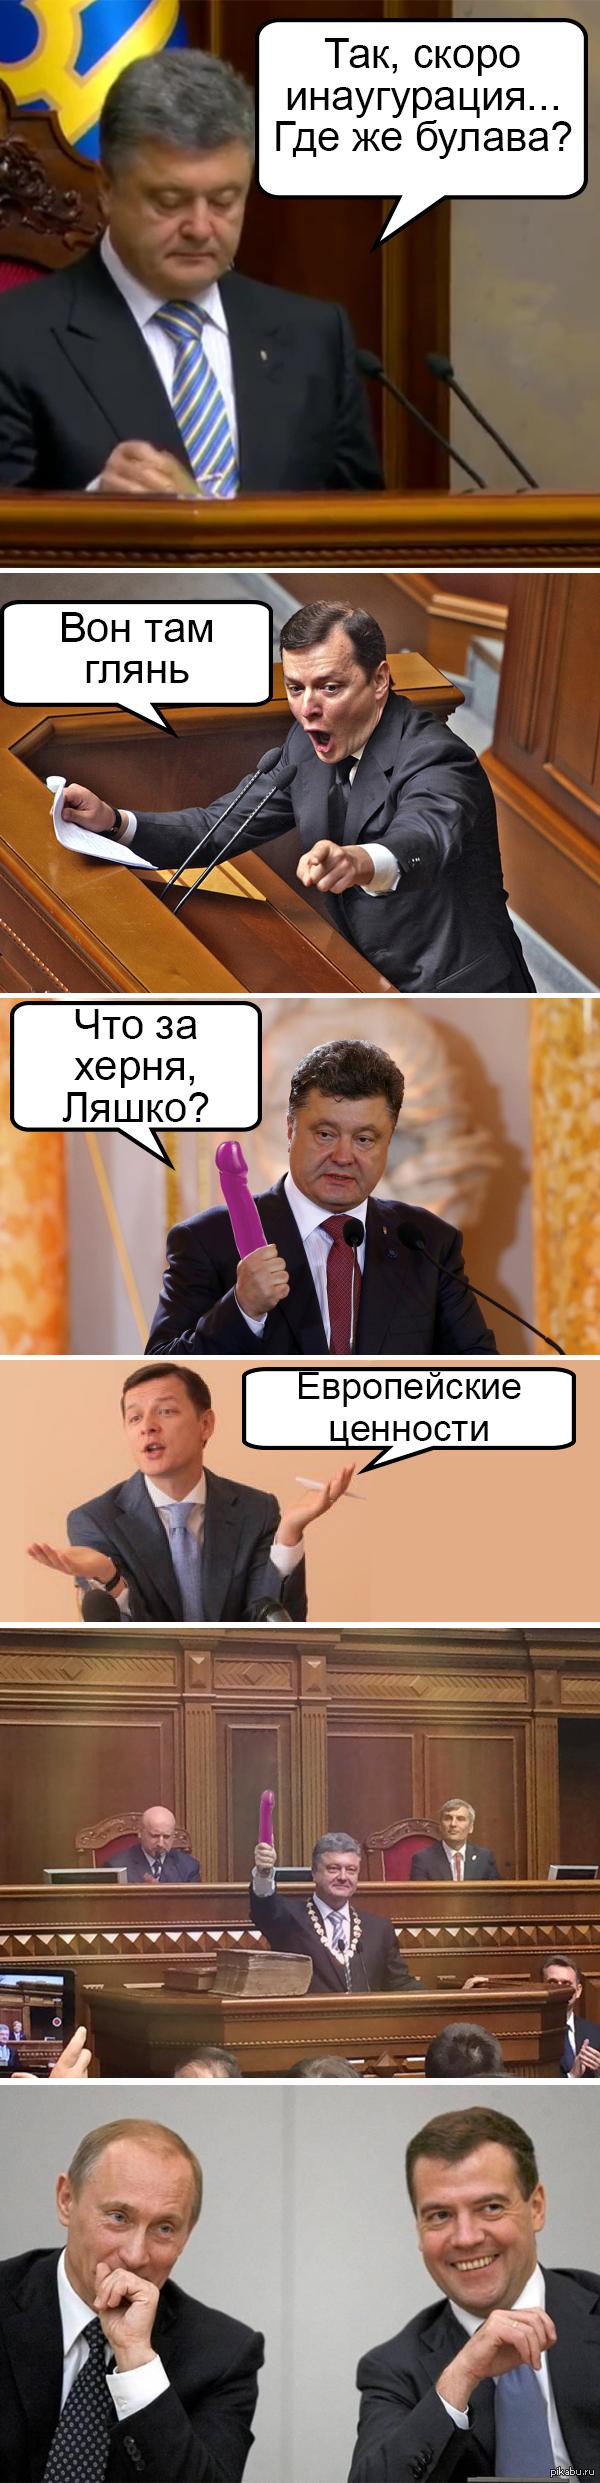 Инаугурация   Инаугурация, Порошенко, Ляшко, длиннопост, Украина, майдан